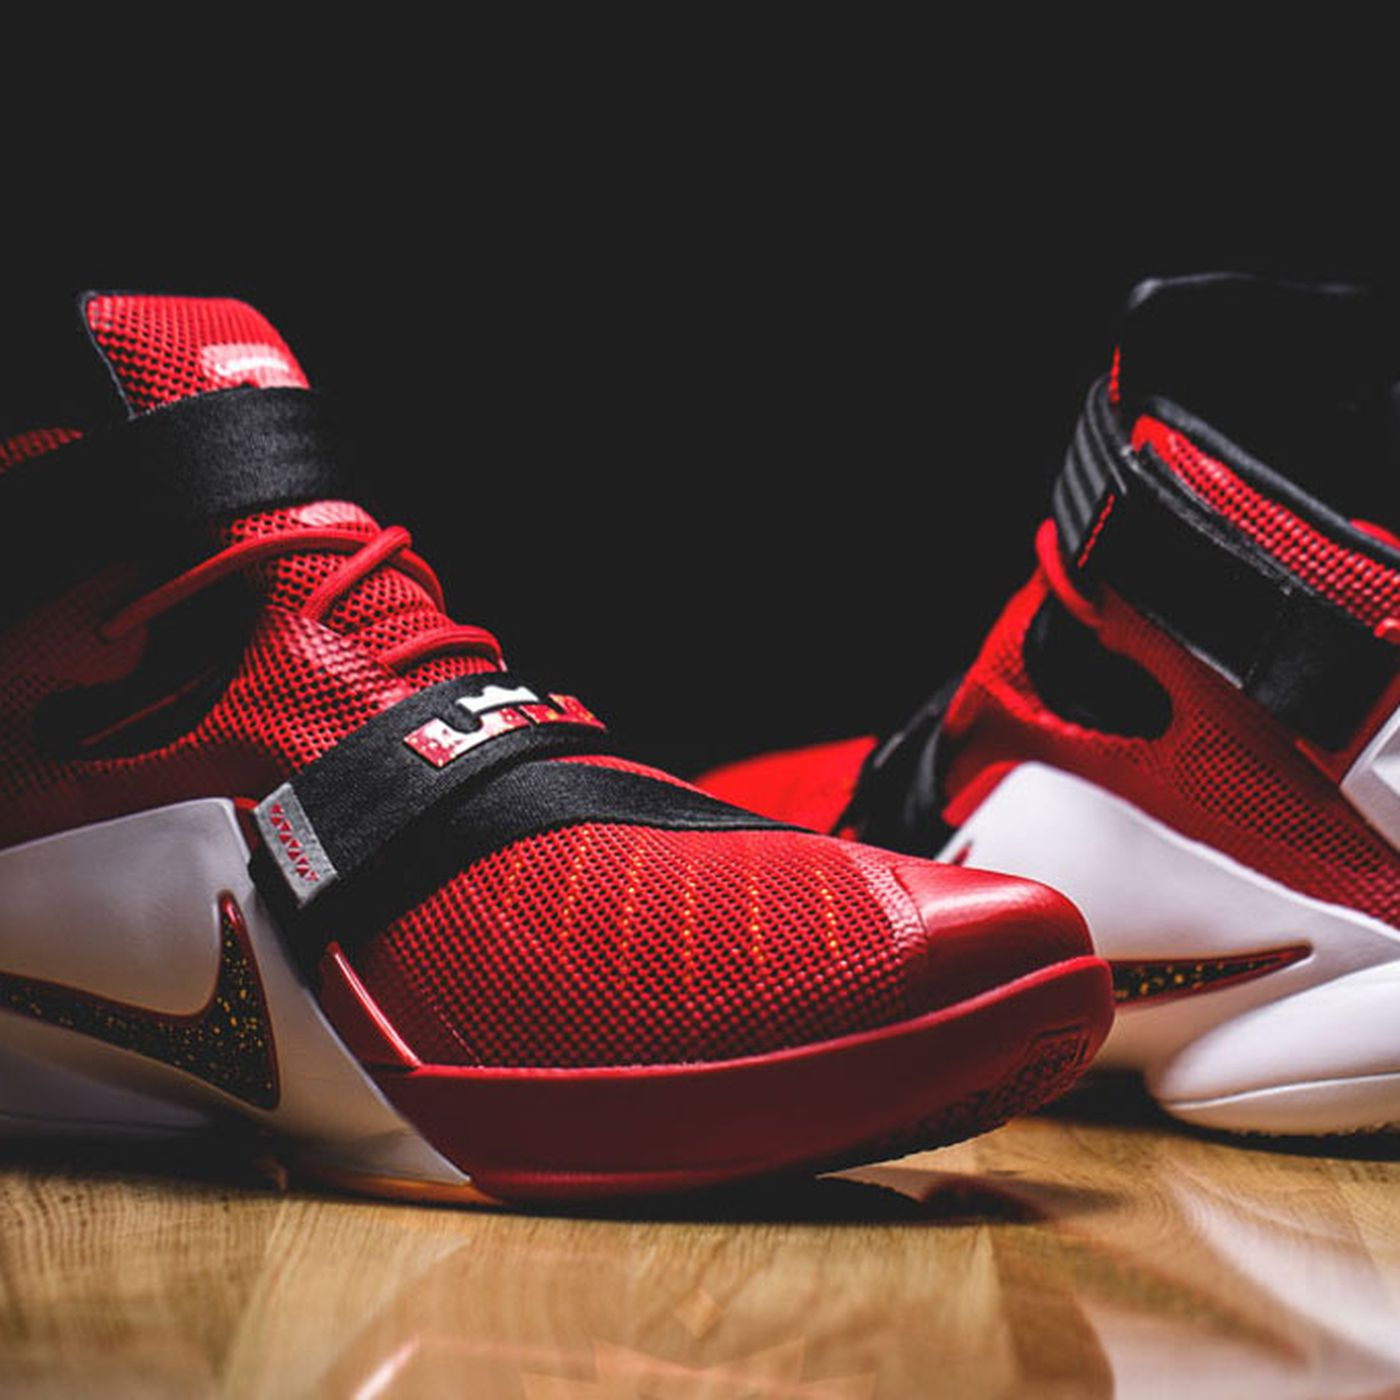 b721d987b8368 Cavs Kicks  Nike Zoom LeBron Soldier 9